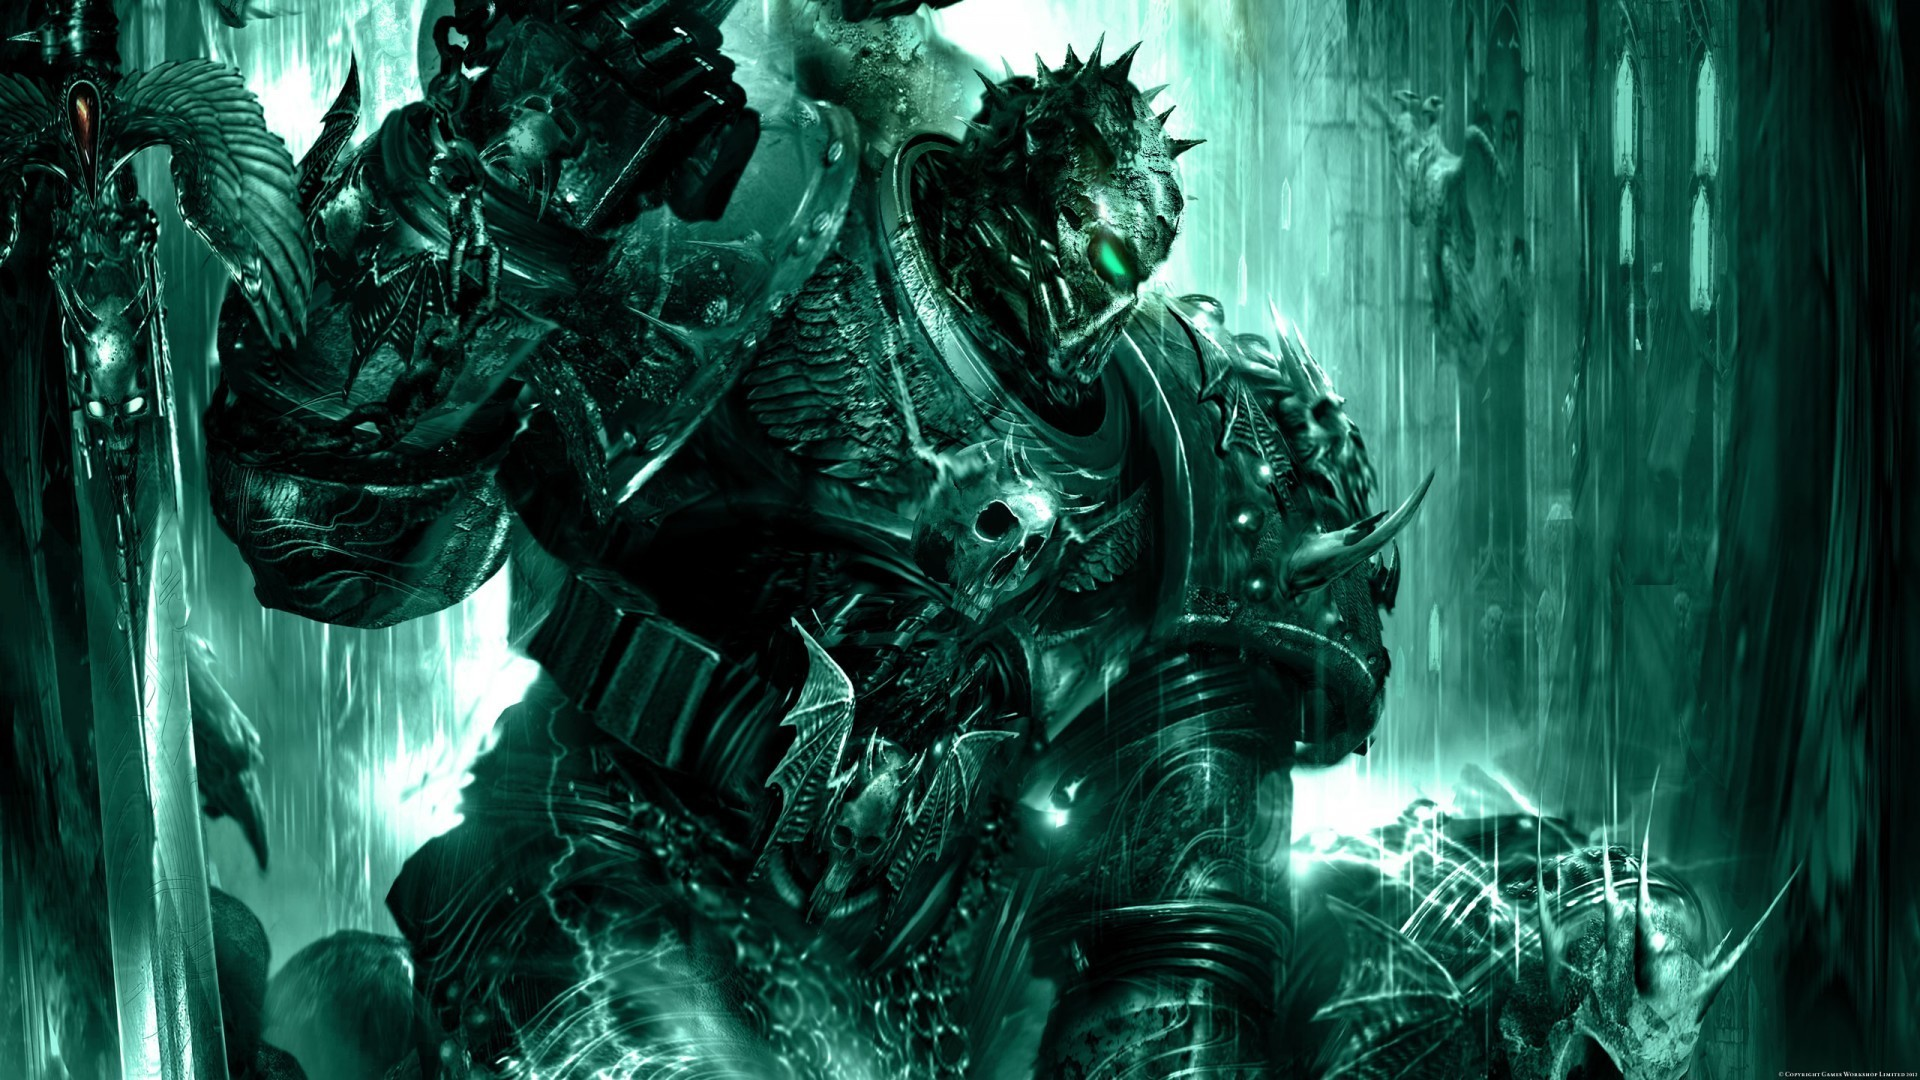 HD-wallpaper -Otife-Warhammer-40k-Fantasy-Art-Artwork-Chaos-Space-Marine-Soul-Hunter-Talos-Hd- Wallpaper-.jpg